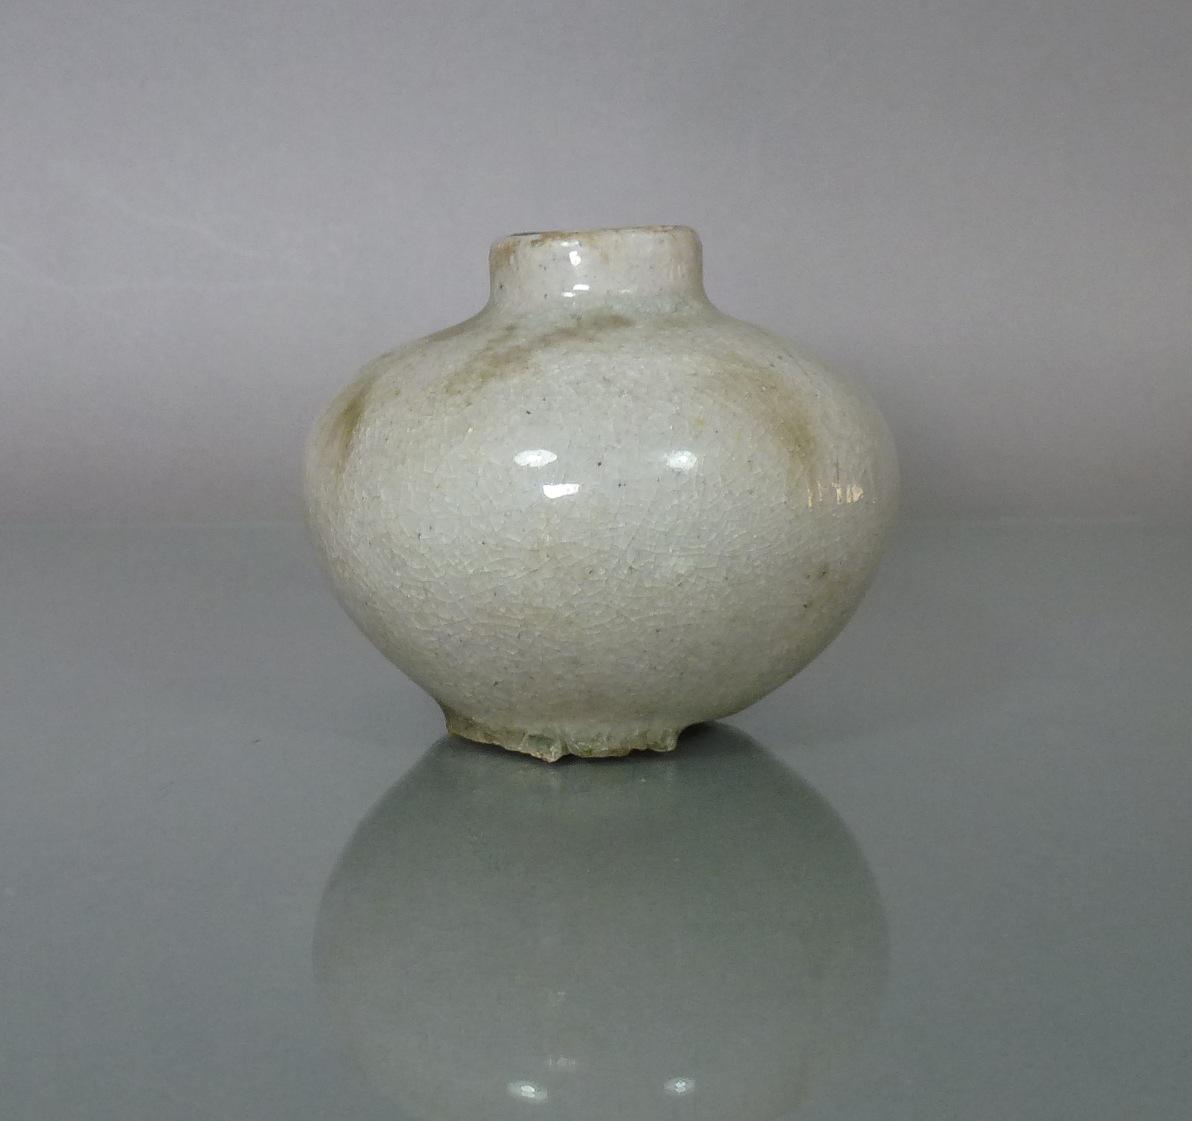 Chinese Song Dynasty Jarlet – Qingbai